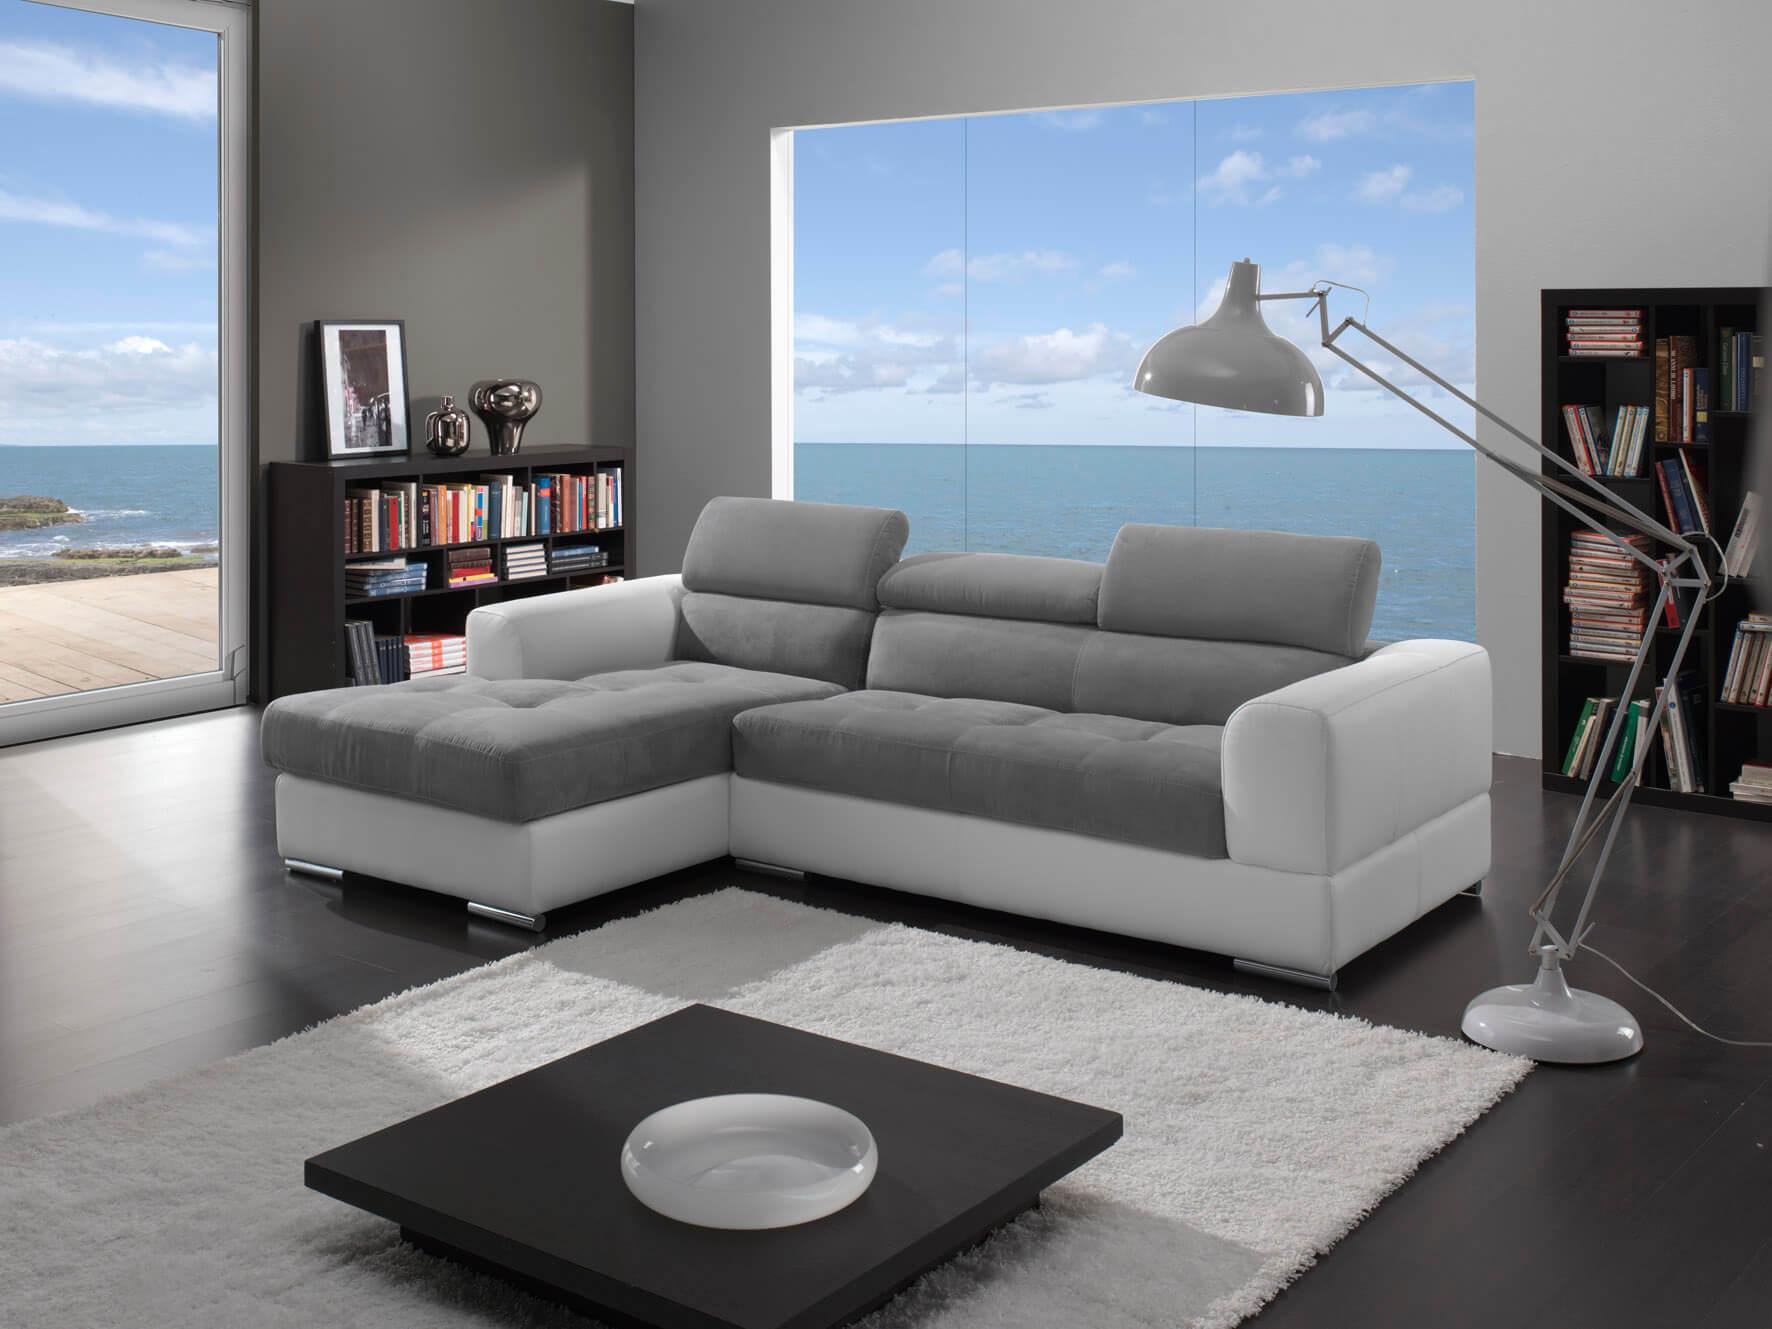 ambre sofa giotto living sofa relax sofa ange sofa sofabed